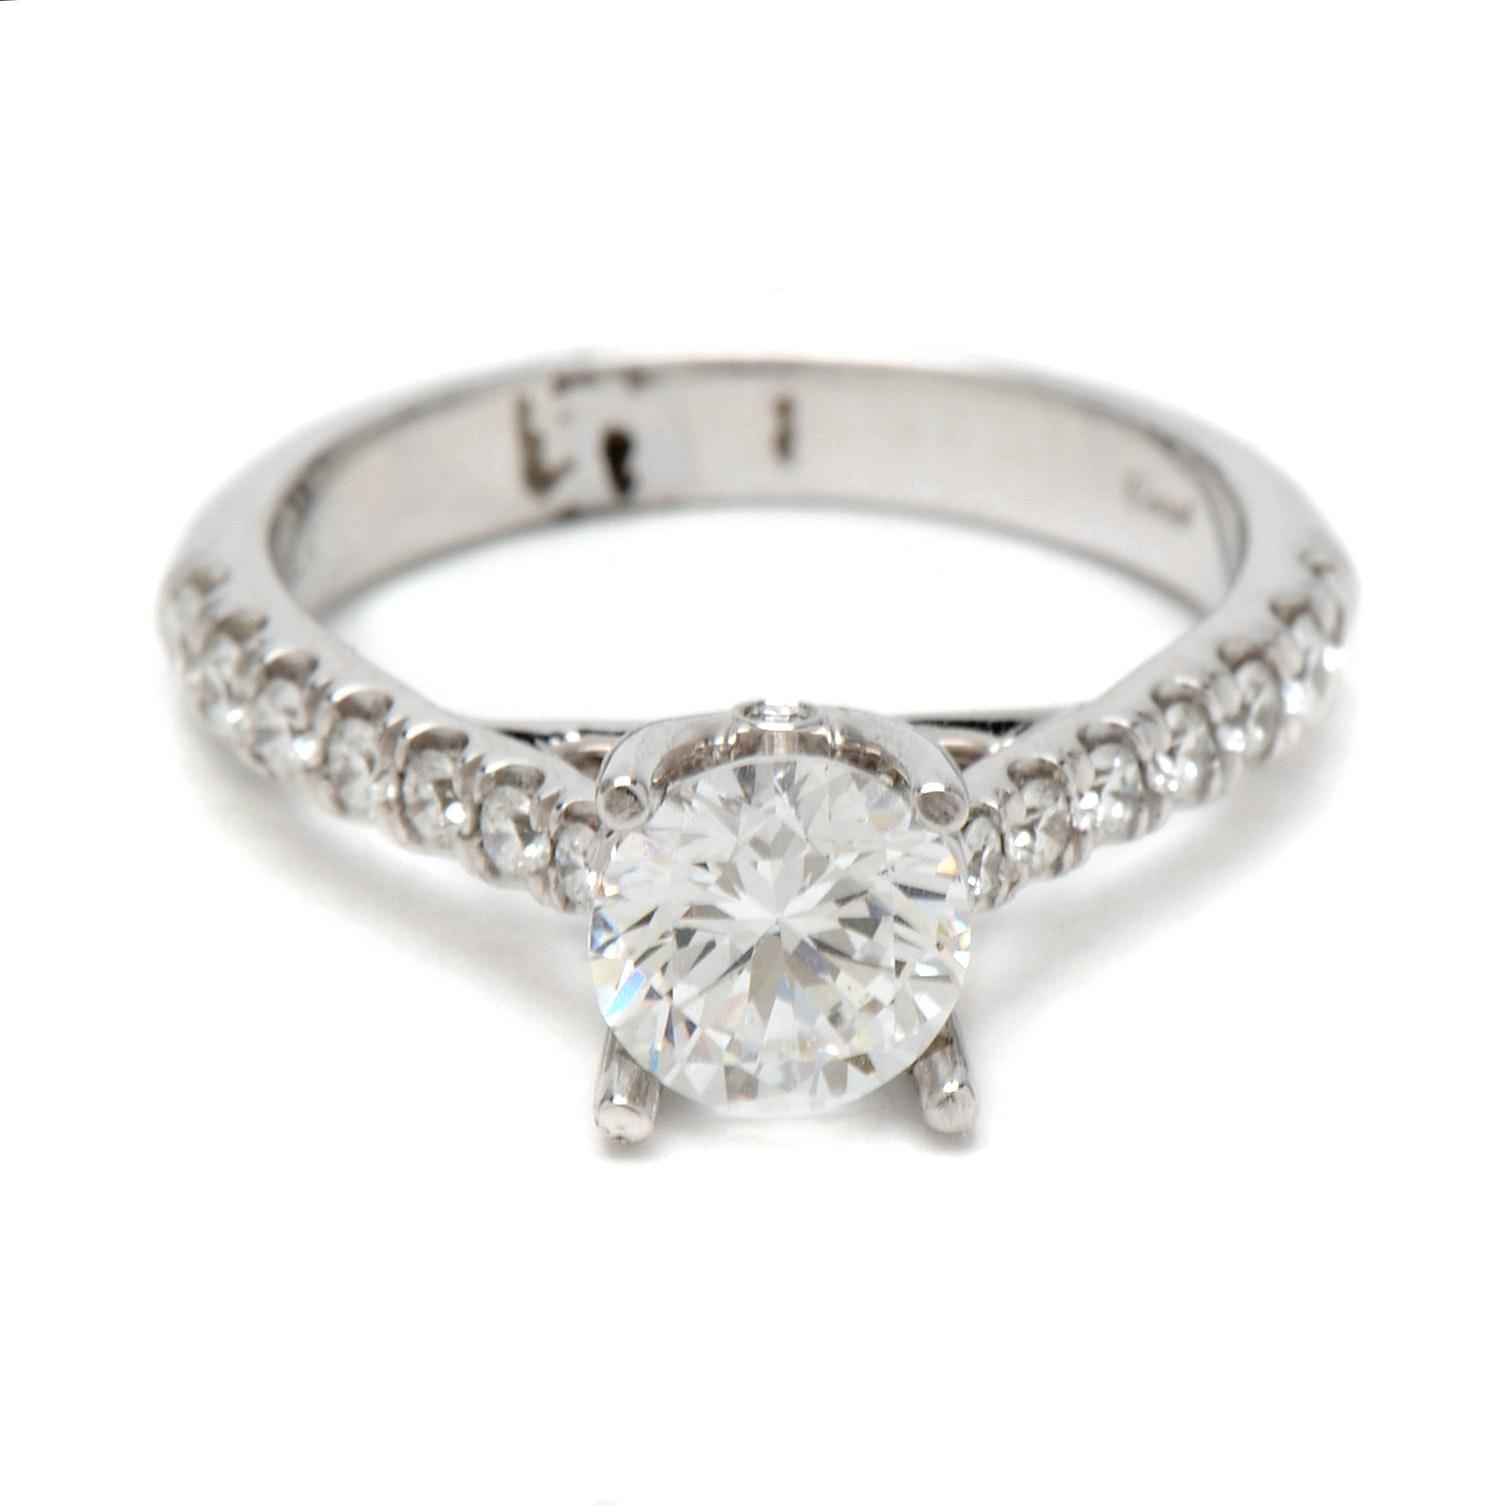 14K White Gold Diamond Semi-Mount Ring With Cubic Zirconia Center Stone